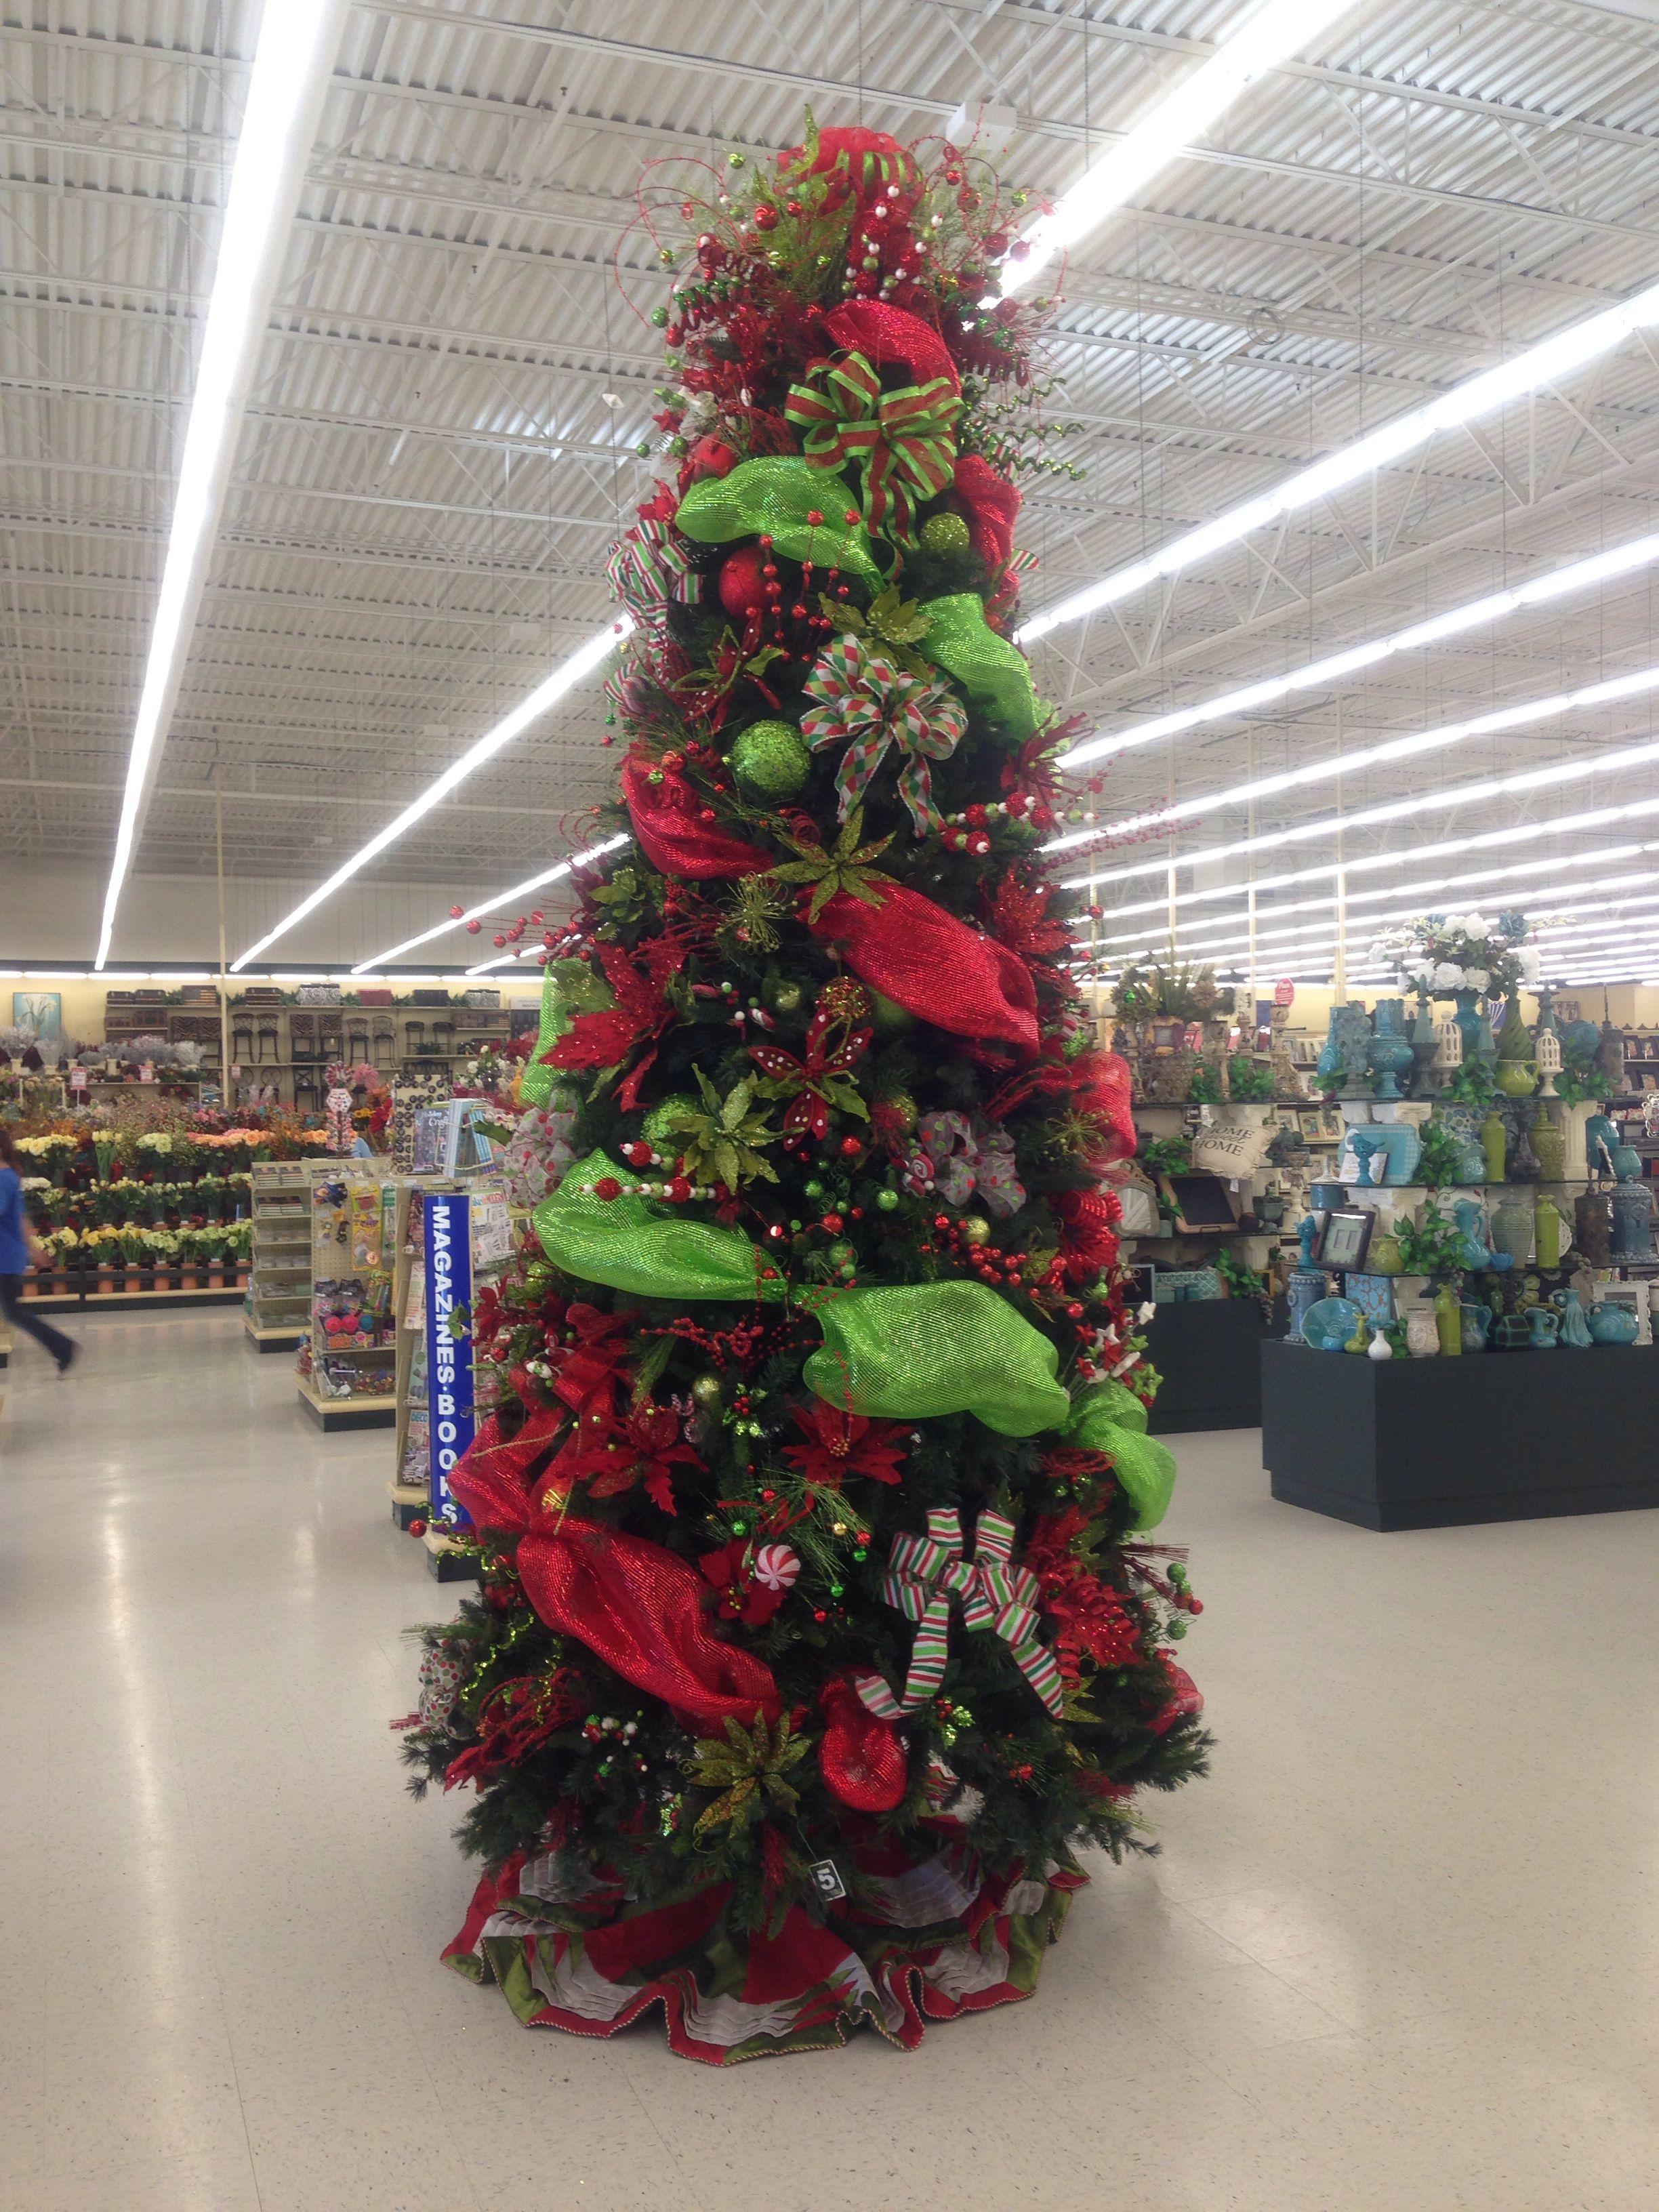 Decorated Christmas tree hobby lobby | Christmas Trees | Pinterest